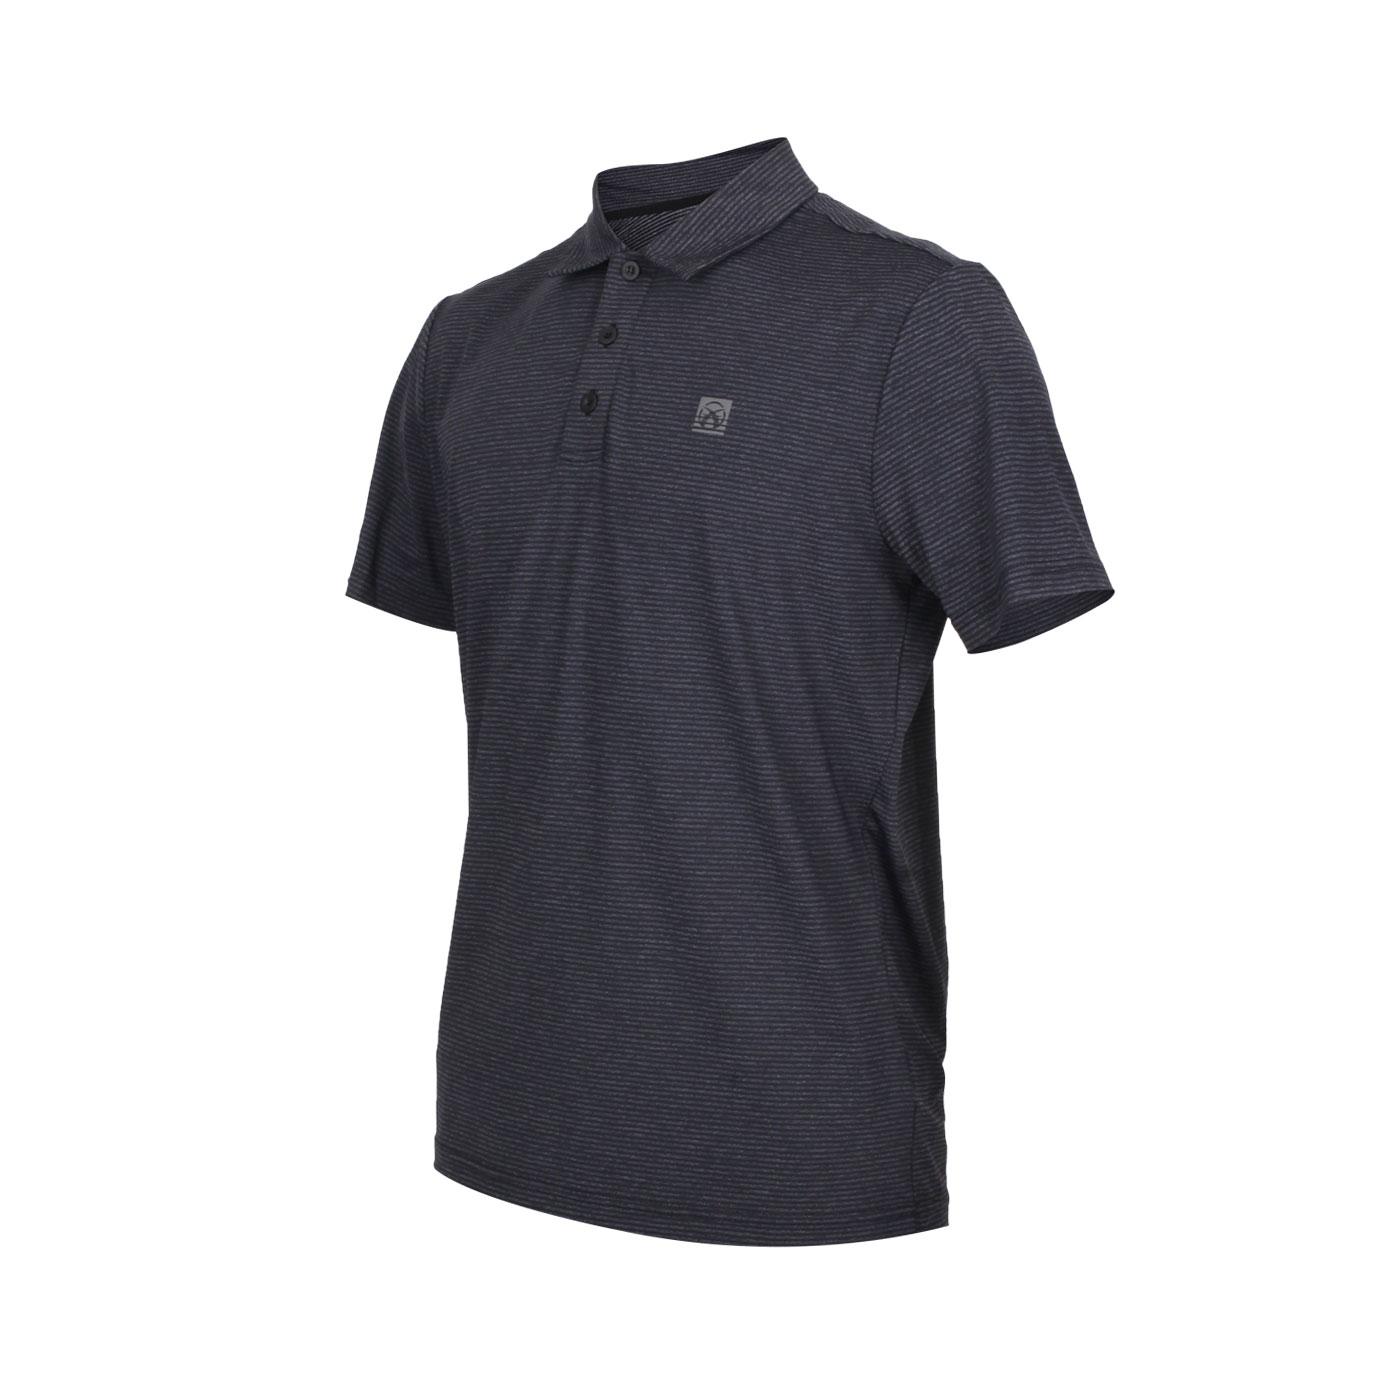 FIRESTAR 男款彈性短袖POLO衫 D0552-18 - 條紋黑灰